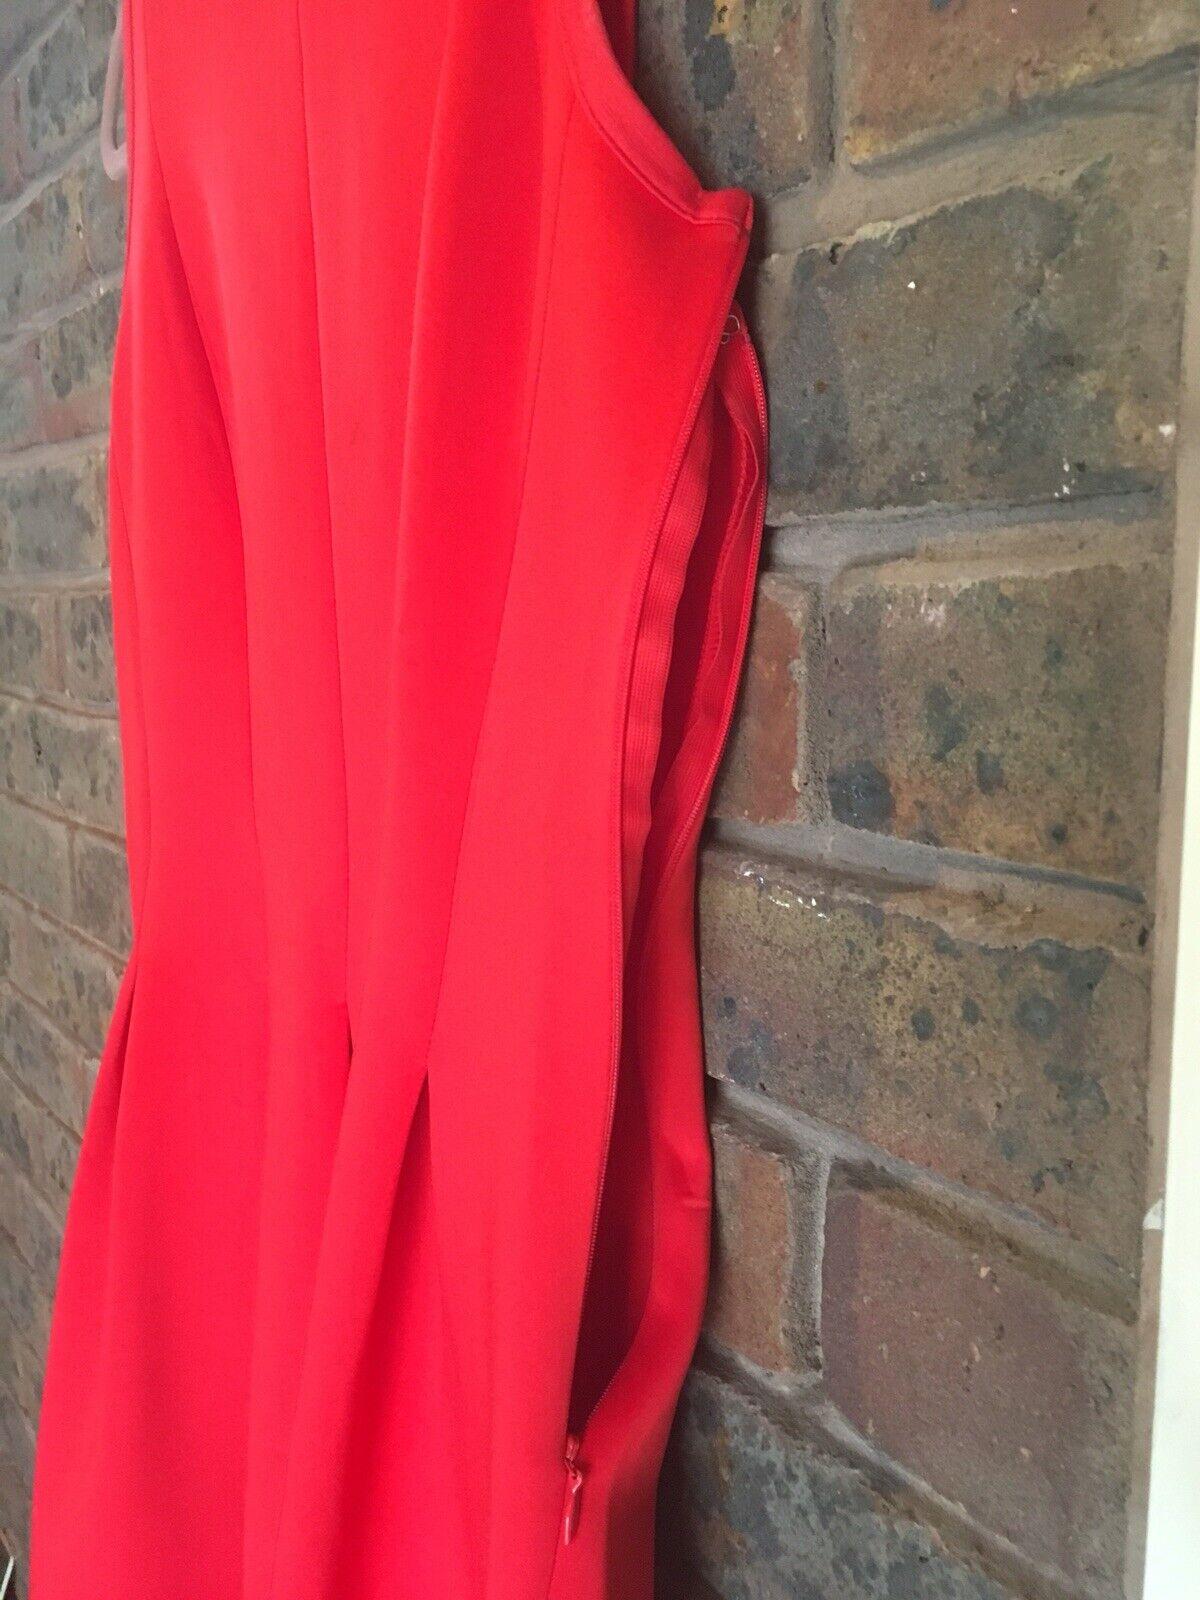 cb7cafbdcd4a ... Ann taylor taylor taylor Womens Red Short Dress US8 UK12 d27a07